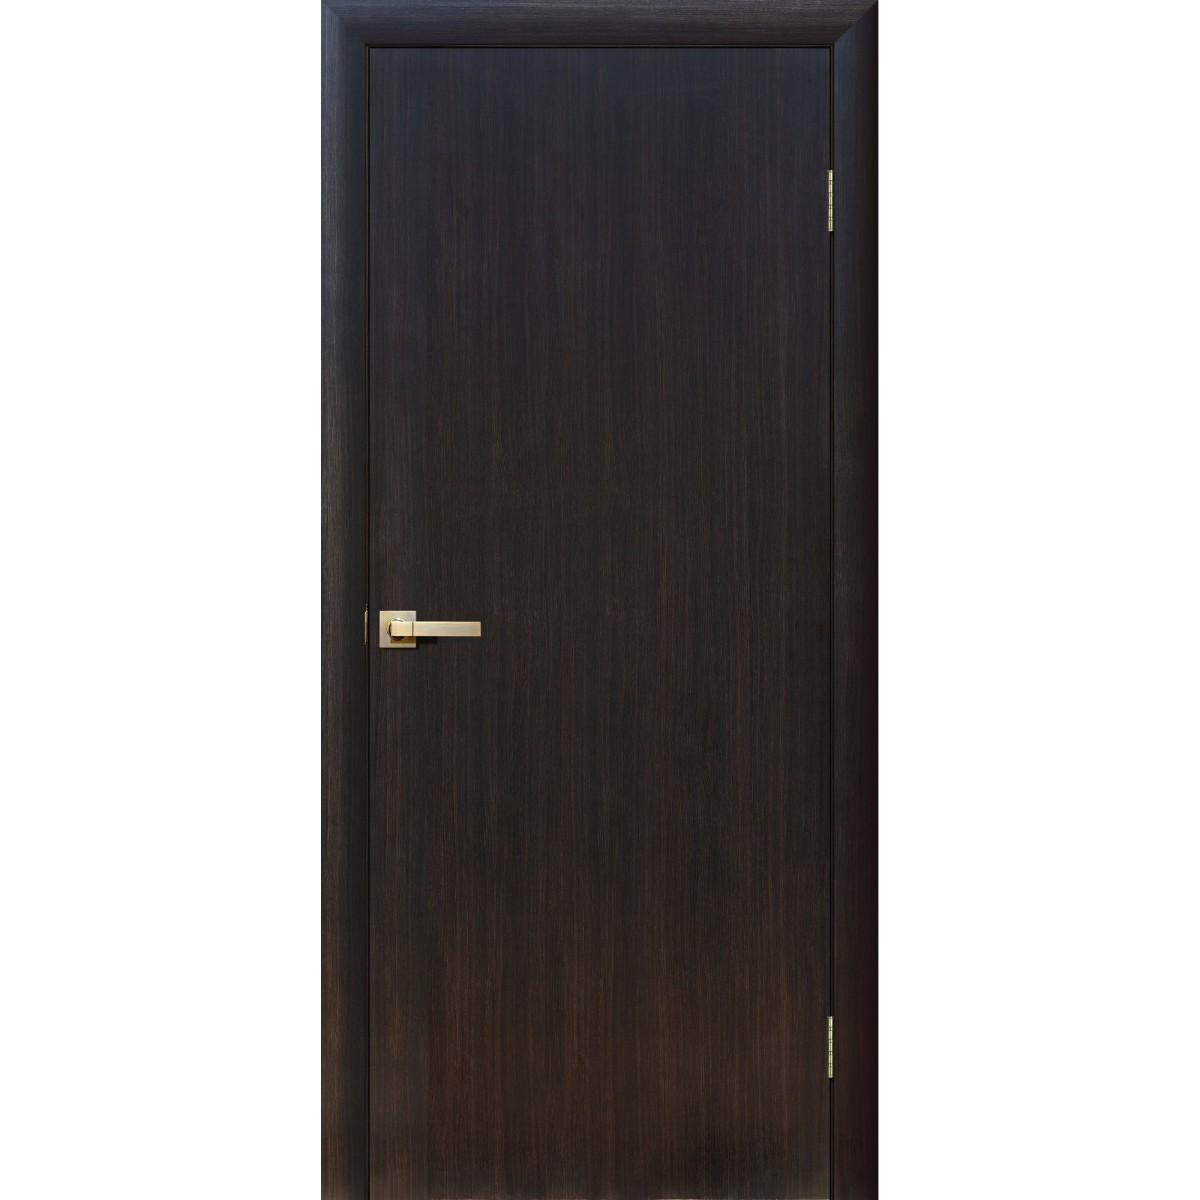 Дверь межкомнатная глухая Стандарт 80x200 см ламинация цвет дуб феррара